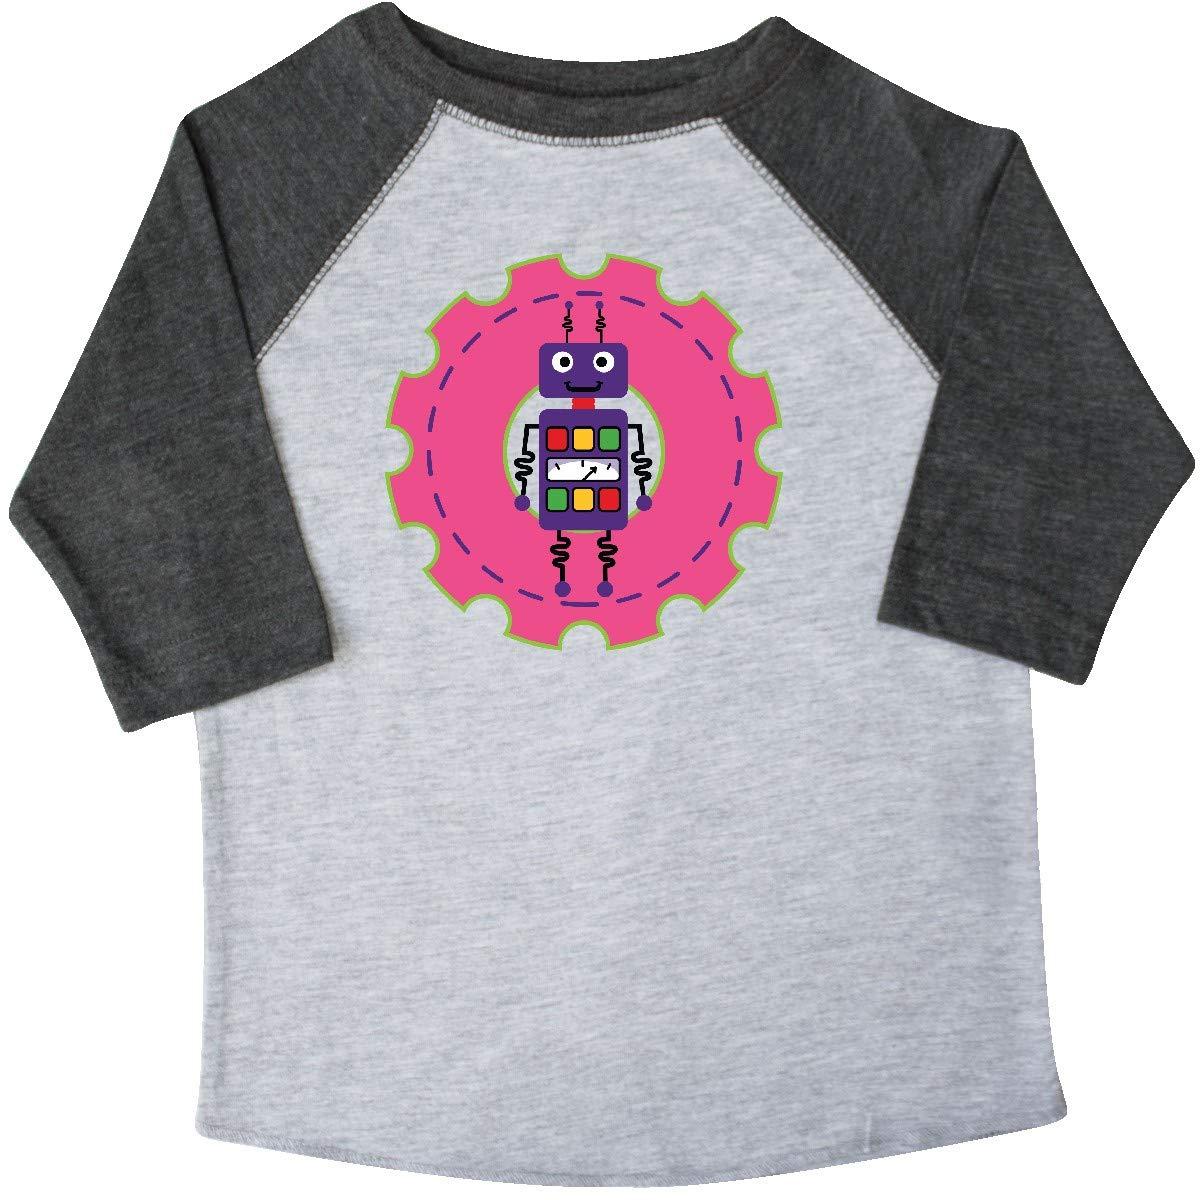 inktastic Robot Girls Science Engineering Toddler T-Shirt